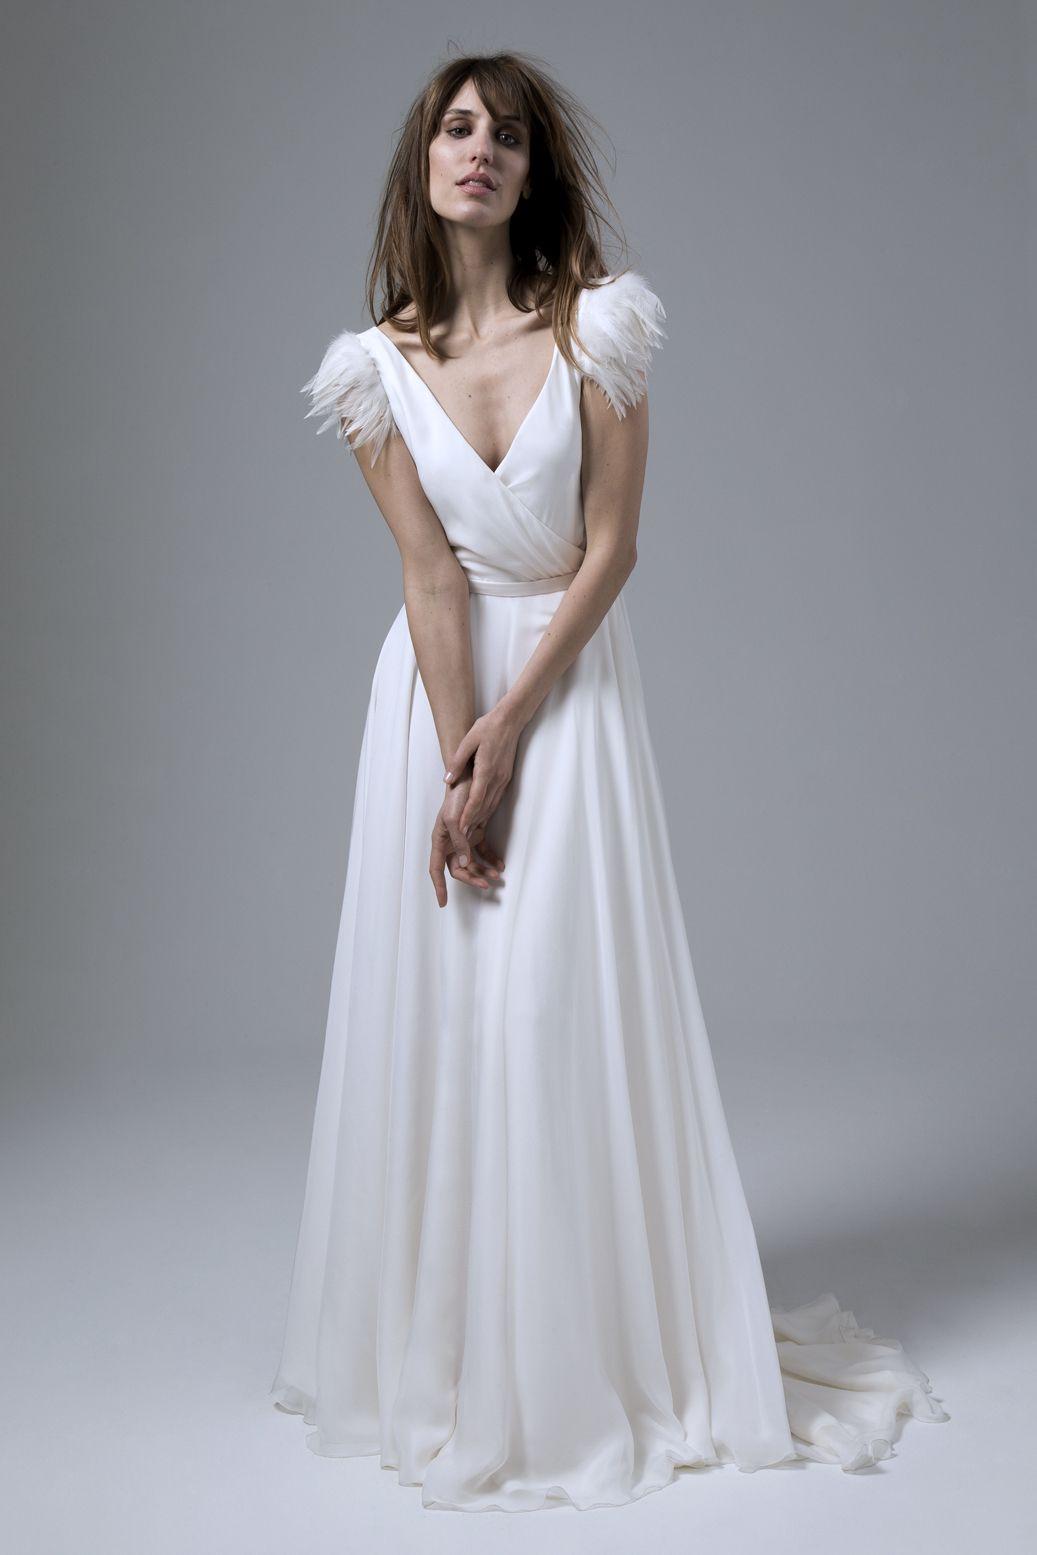 Bridal fashion wrap over floaty chiffon dress plunging v back